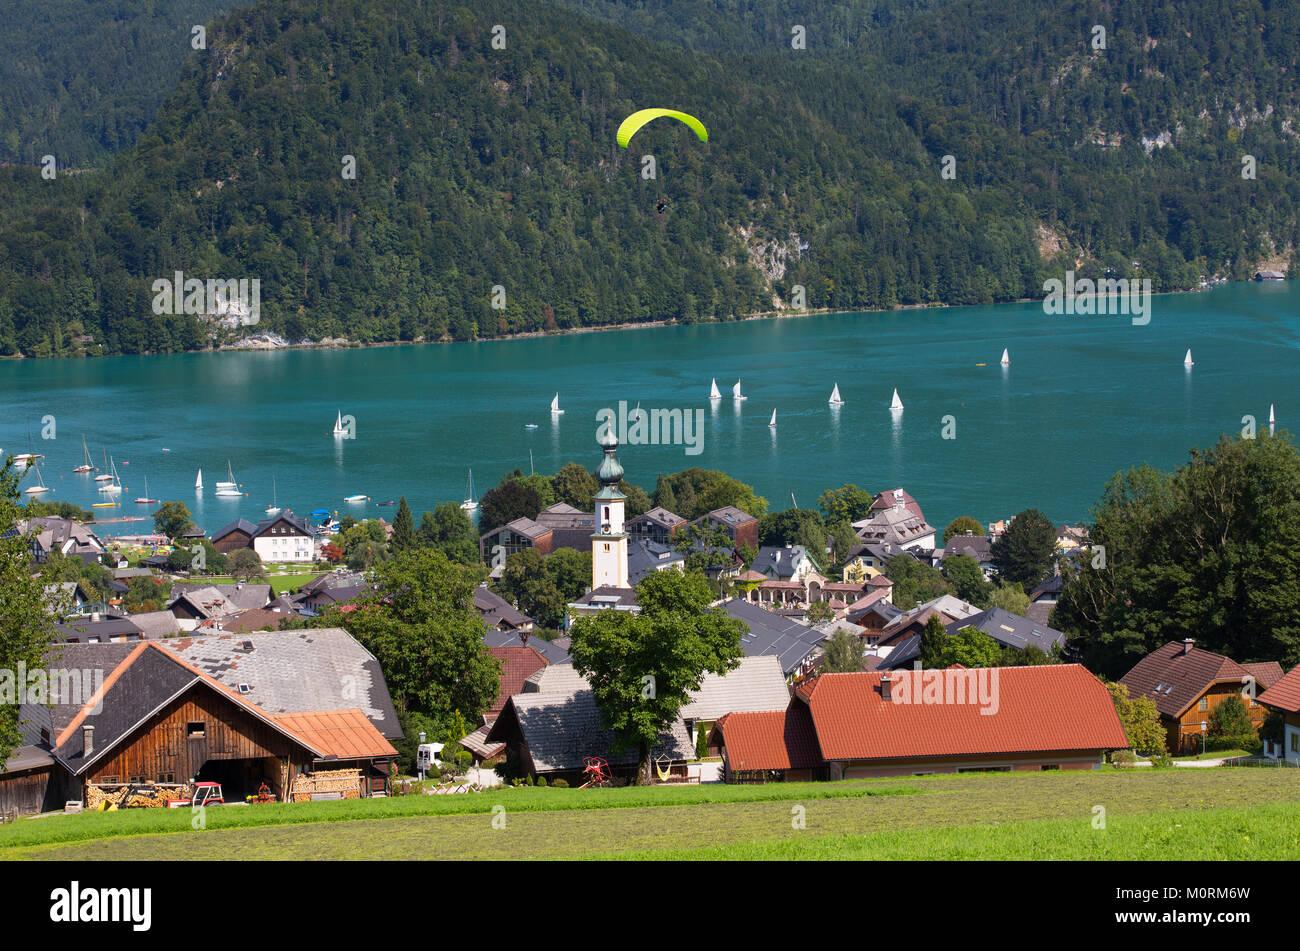 Austria, Salzburg State, Salzkammergut, Sankt Gilgen, Lake Wolfgangsee, Paraglider - Stock Image